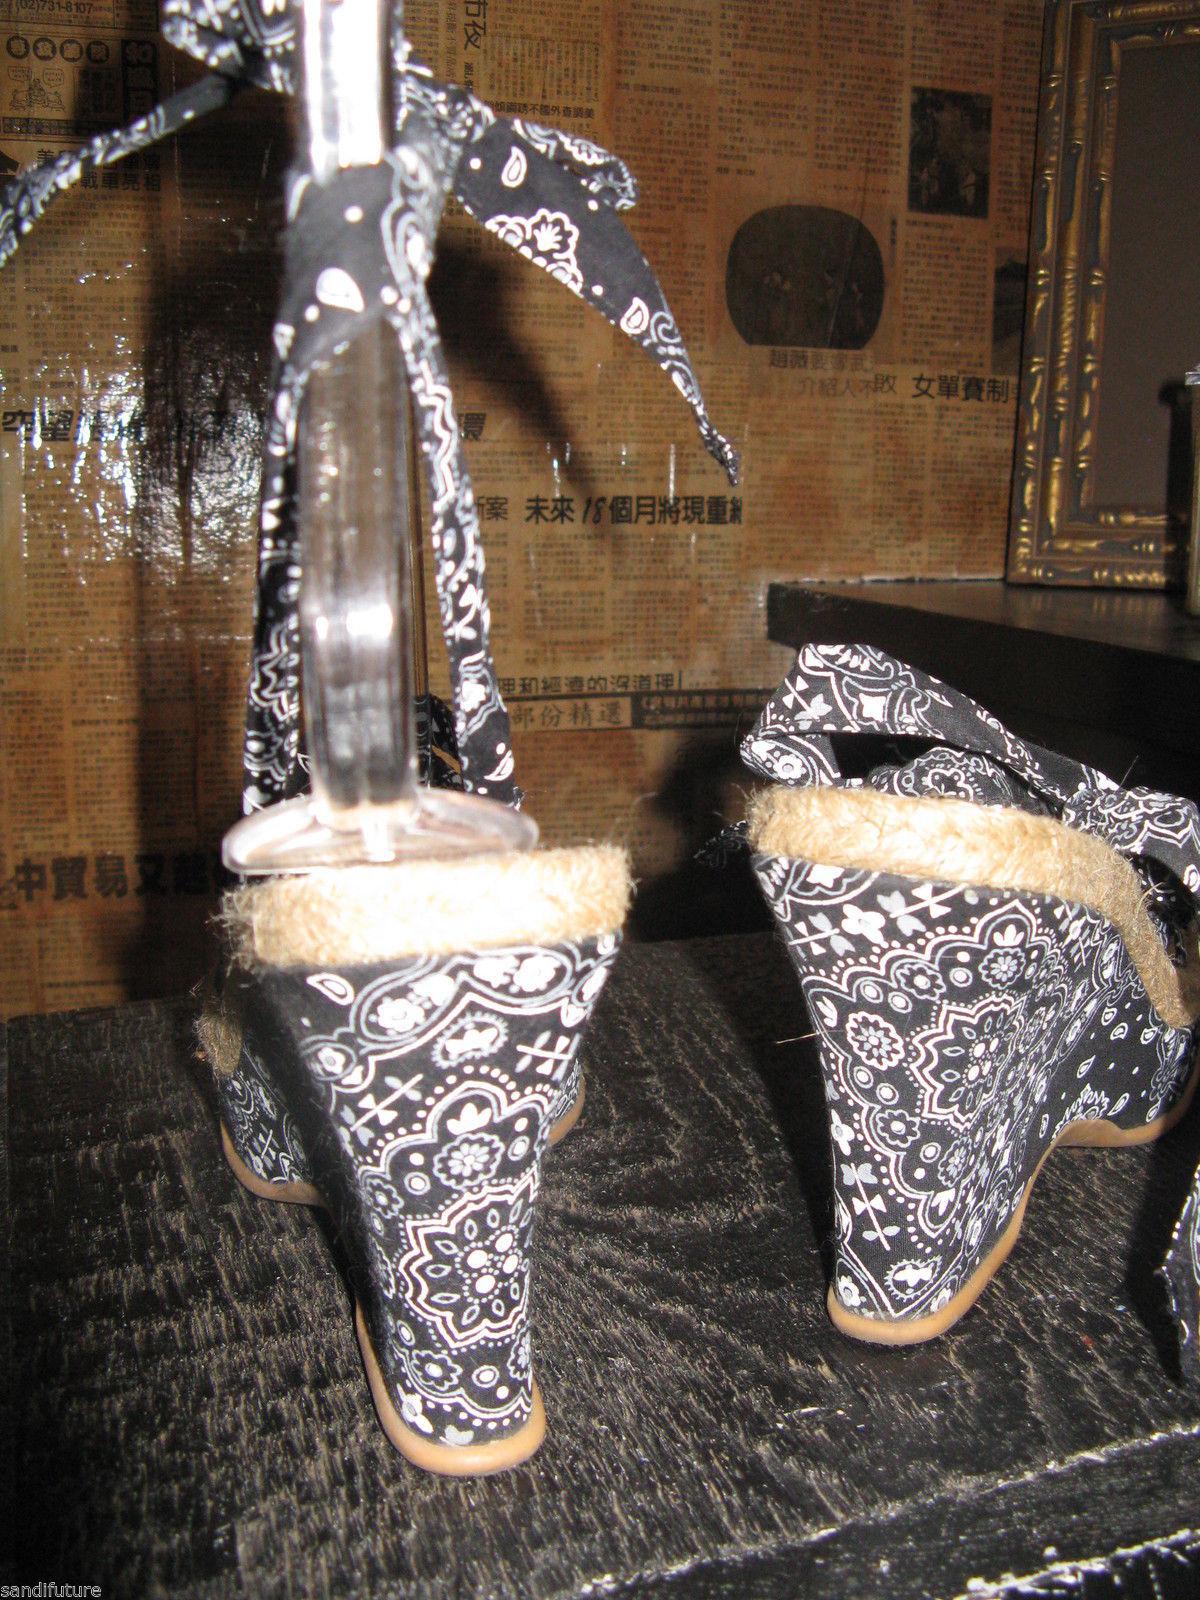 NuvoLaBella bandanna Tiki Oasis platform wedge sandals shoes VLV 6.5 UK4 37